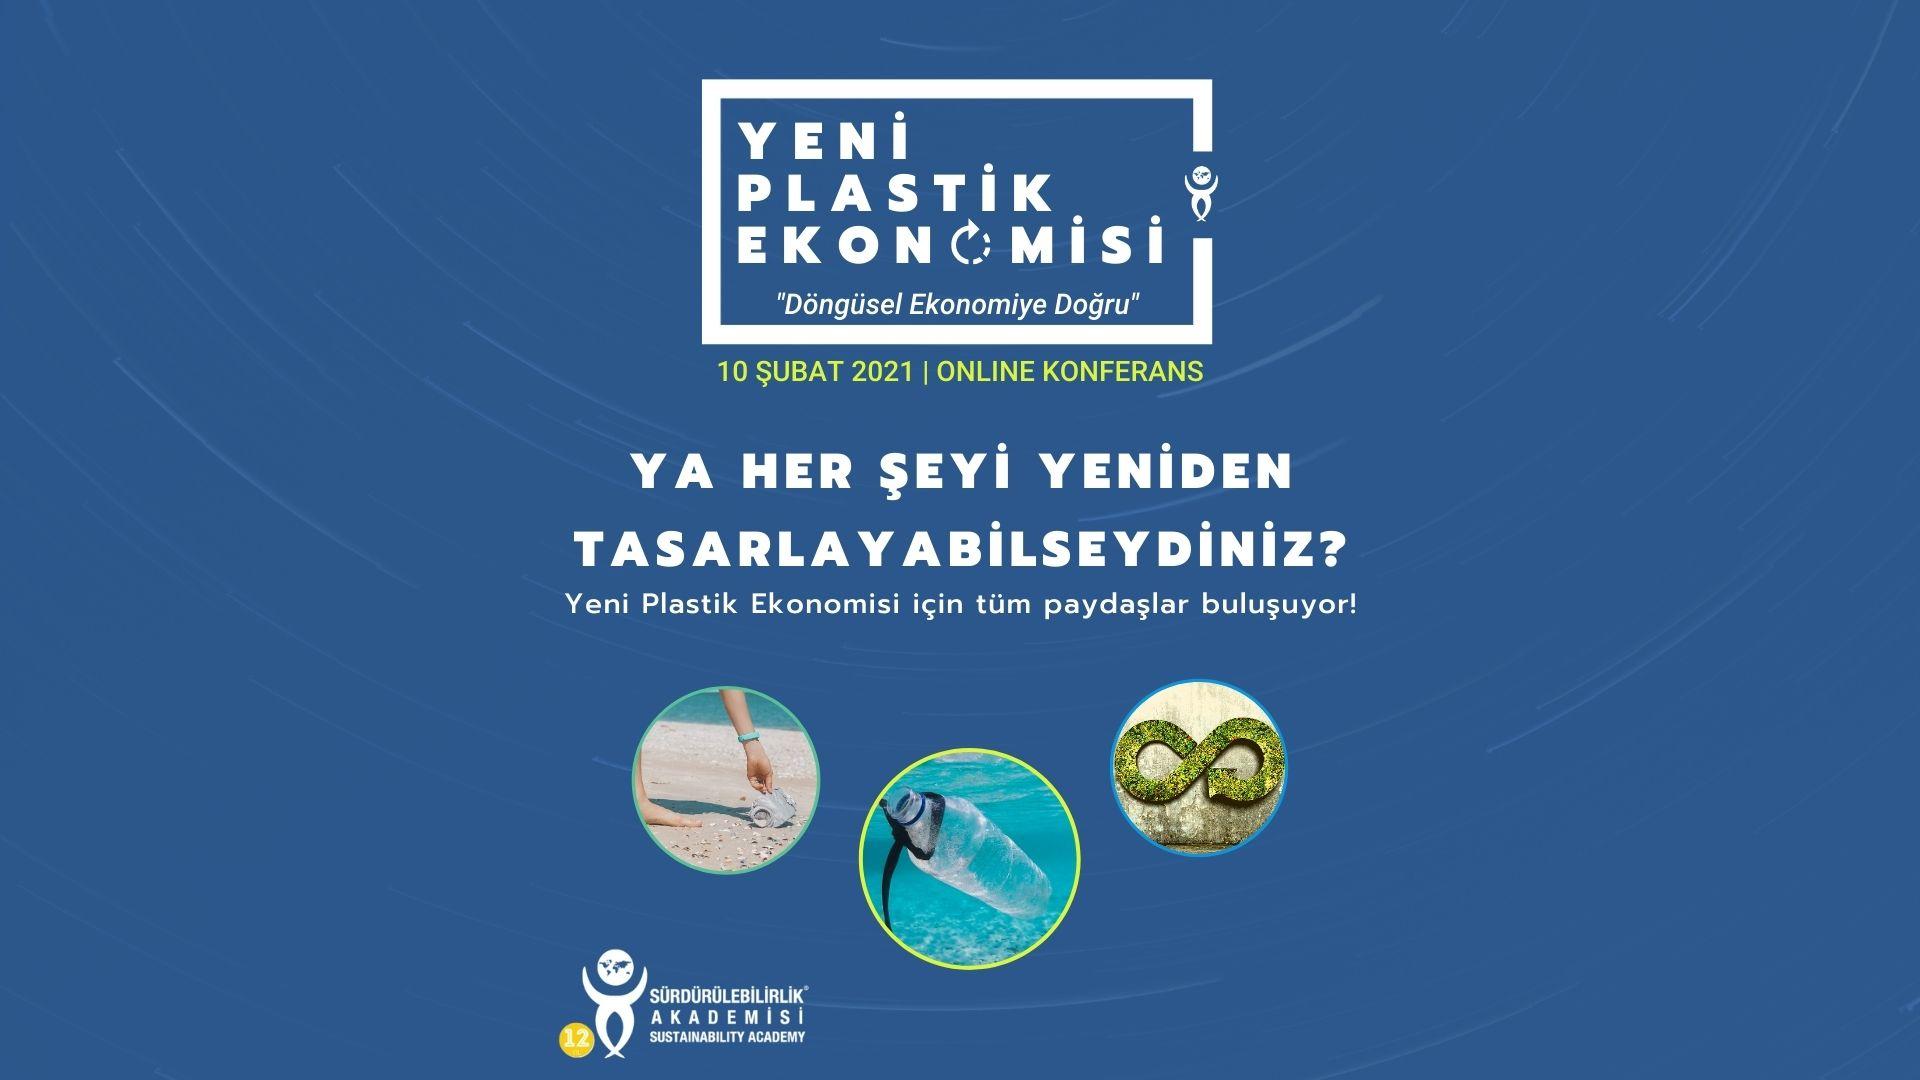 Yeni Plastik Ekonomisi Konferansı